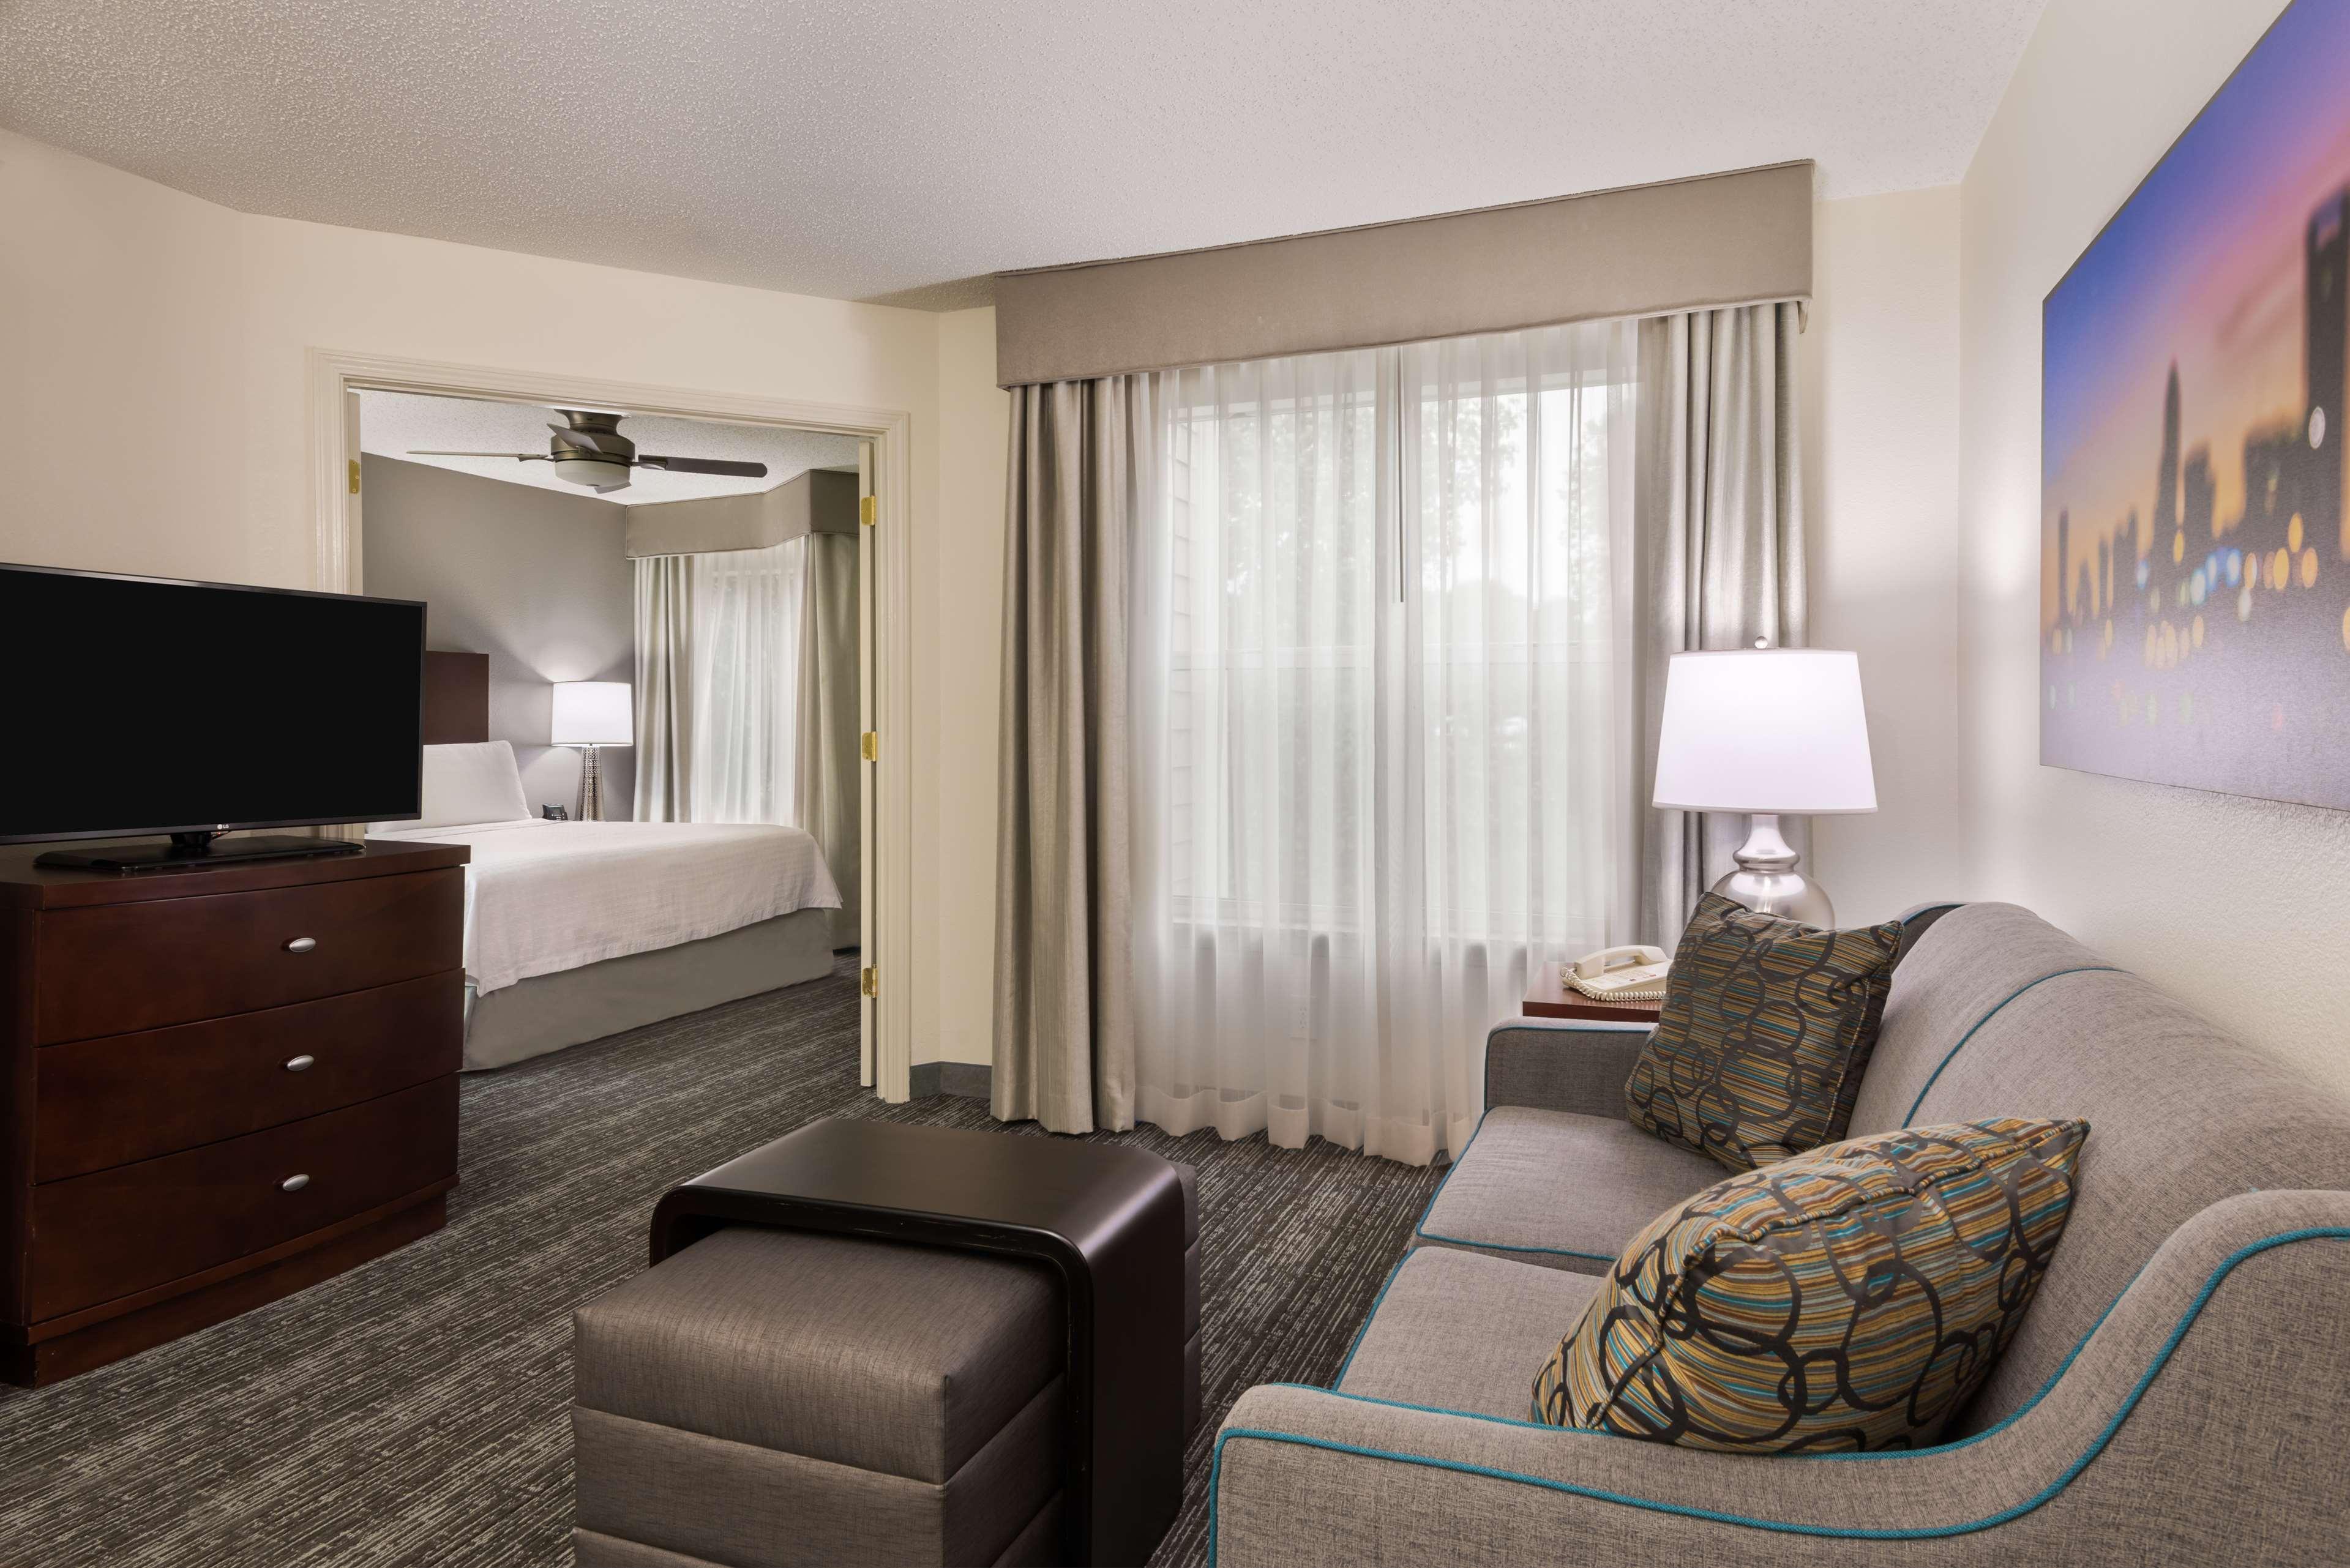 Homewood Suites by Hilton Charlotte-North/Univ Research Park image 18